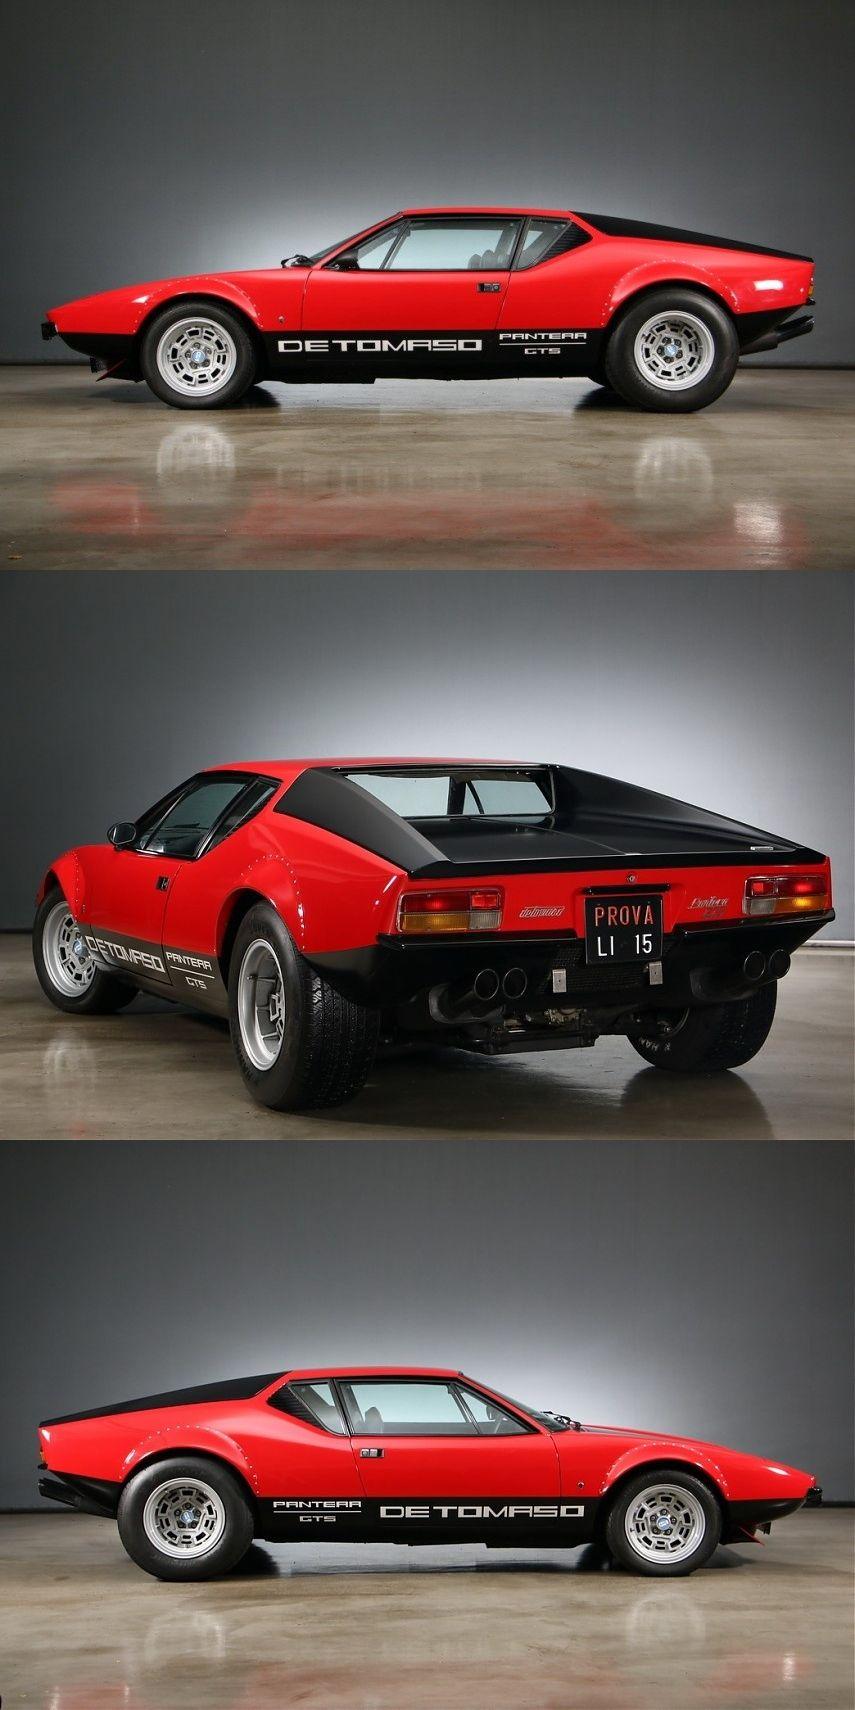 1972 De Tomaso Pantera 5 7 Ltr Gts Old Sports Cars Classic